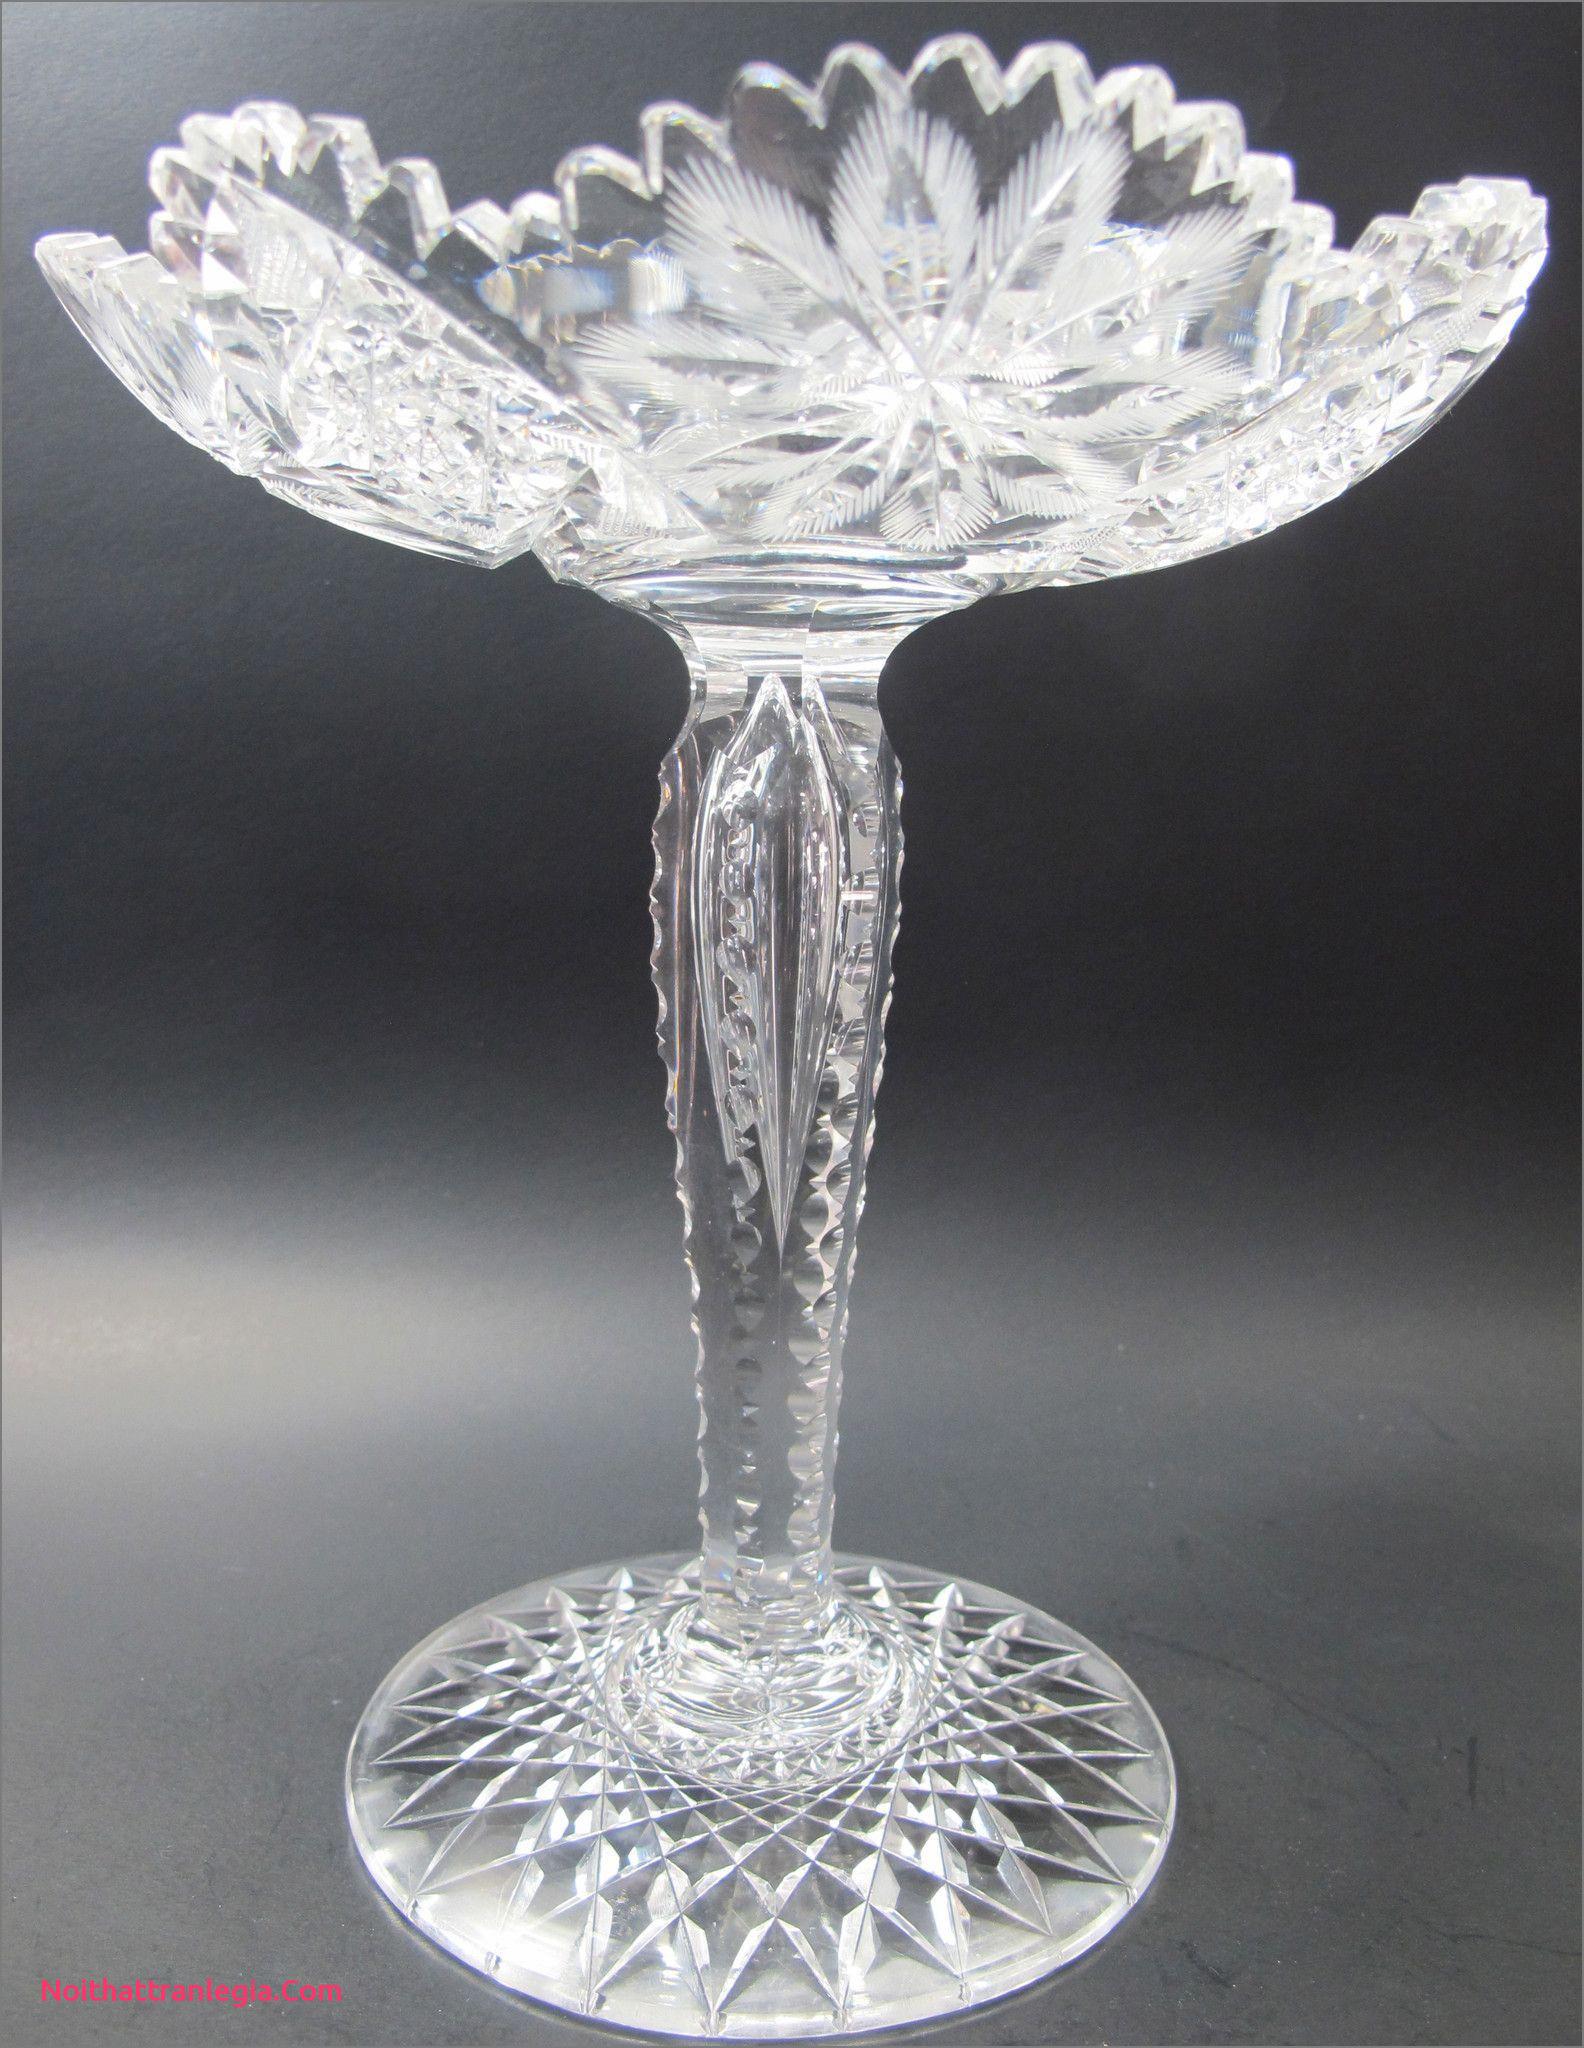 blue cut crystal vase of 20 cut glass antique vase noithattranlegia vases design regarding fering this abp antique cut glass pote from the american brilliant period 1886 1916 9 5